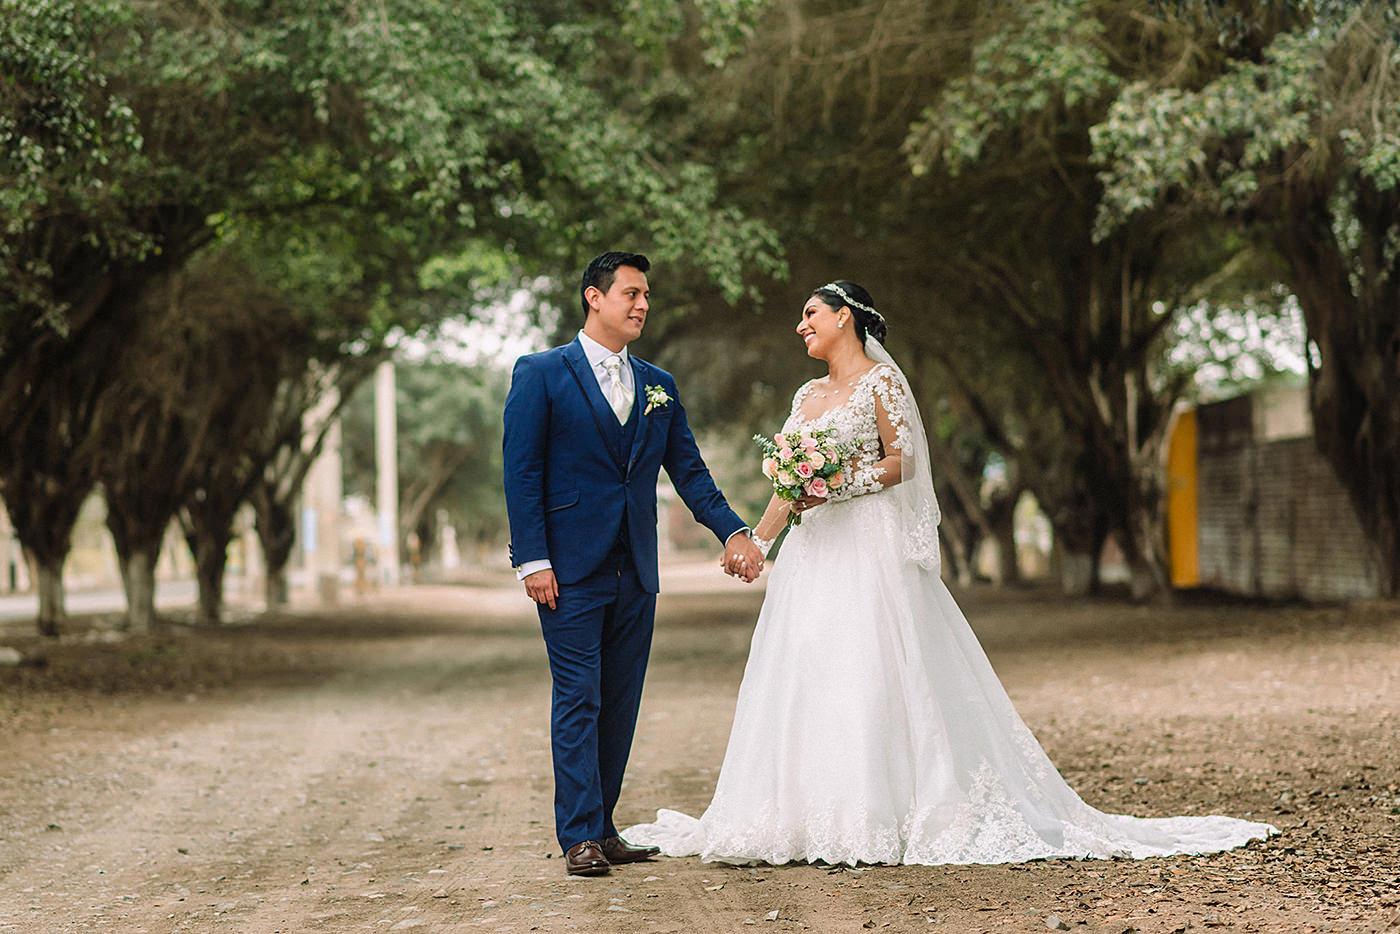 luisjara fotografo de bodas